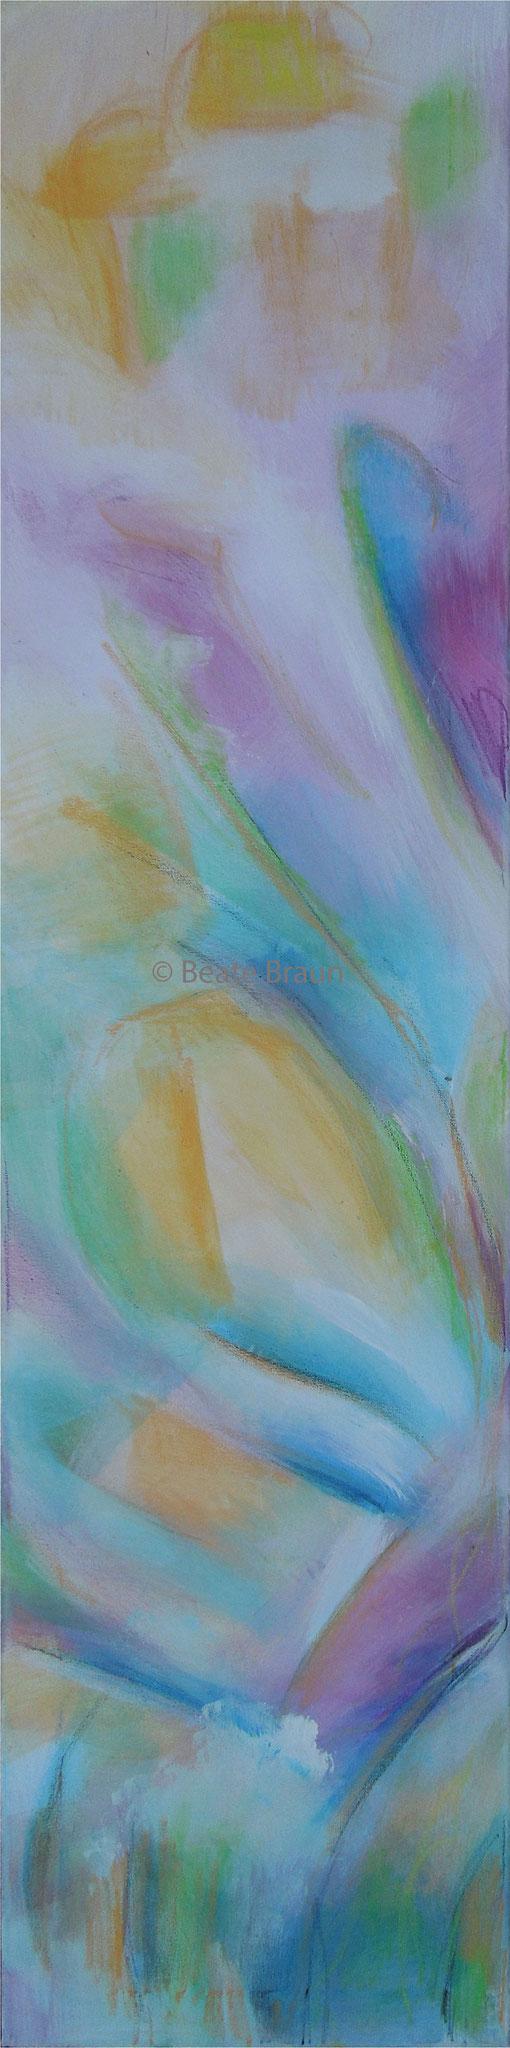 Erblühen 1 | 30 x 100cm | Acryl auf Leinwand | 2017